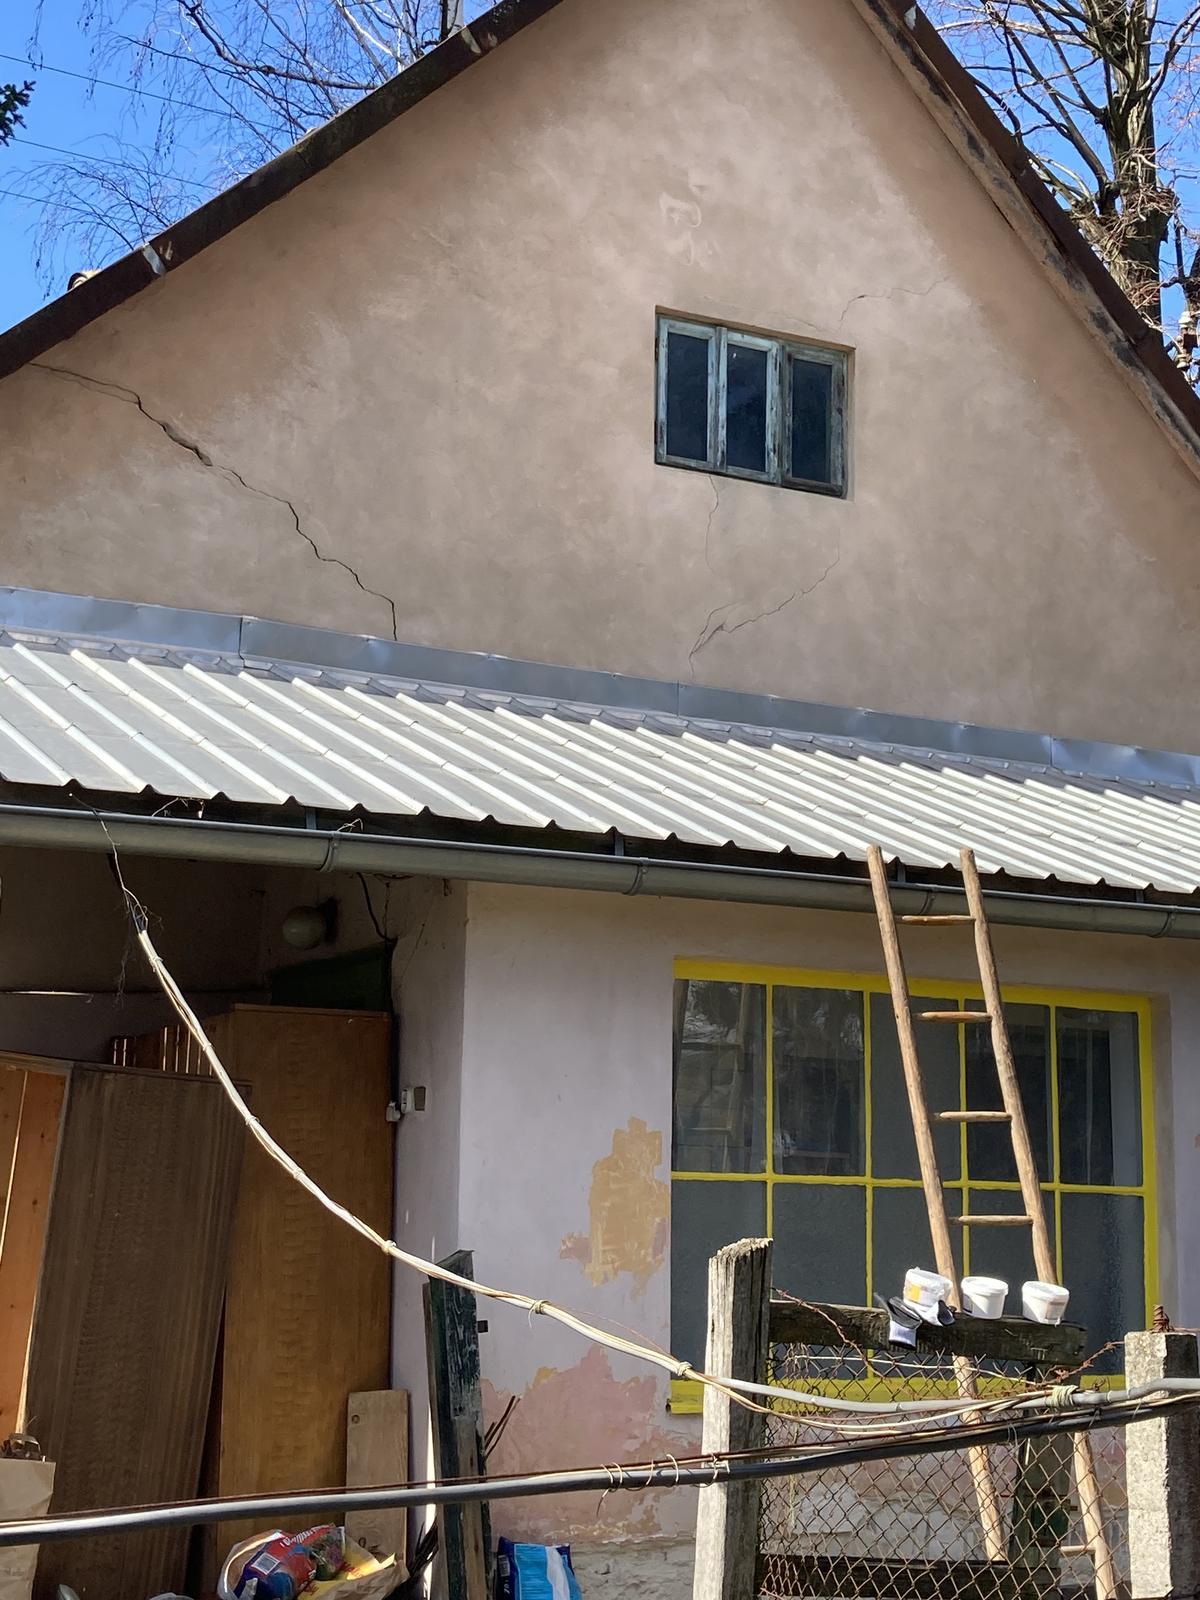 Dom - vsetko nakupene, ide sa na opravu fasady